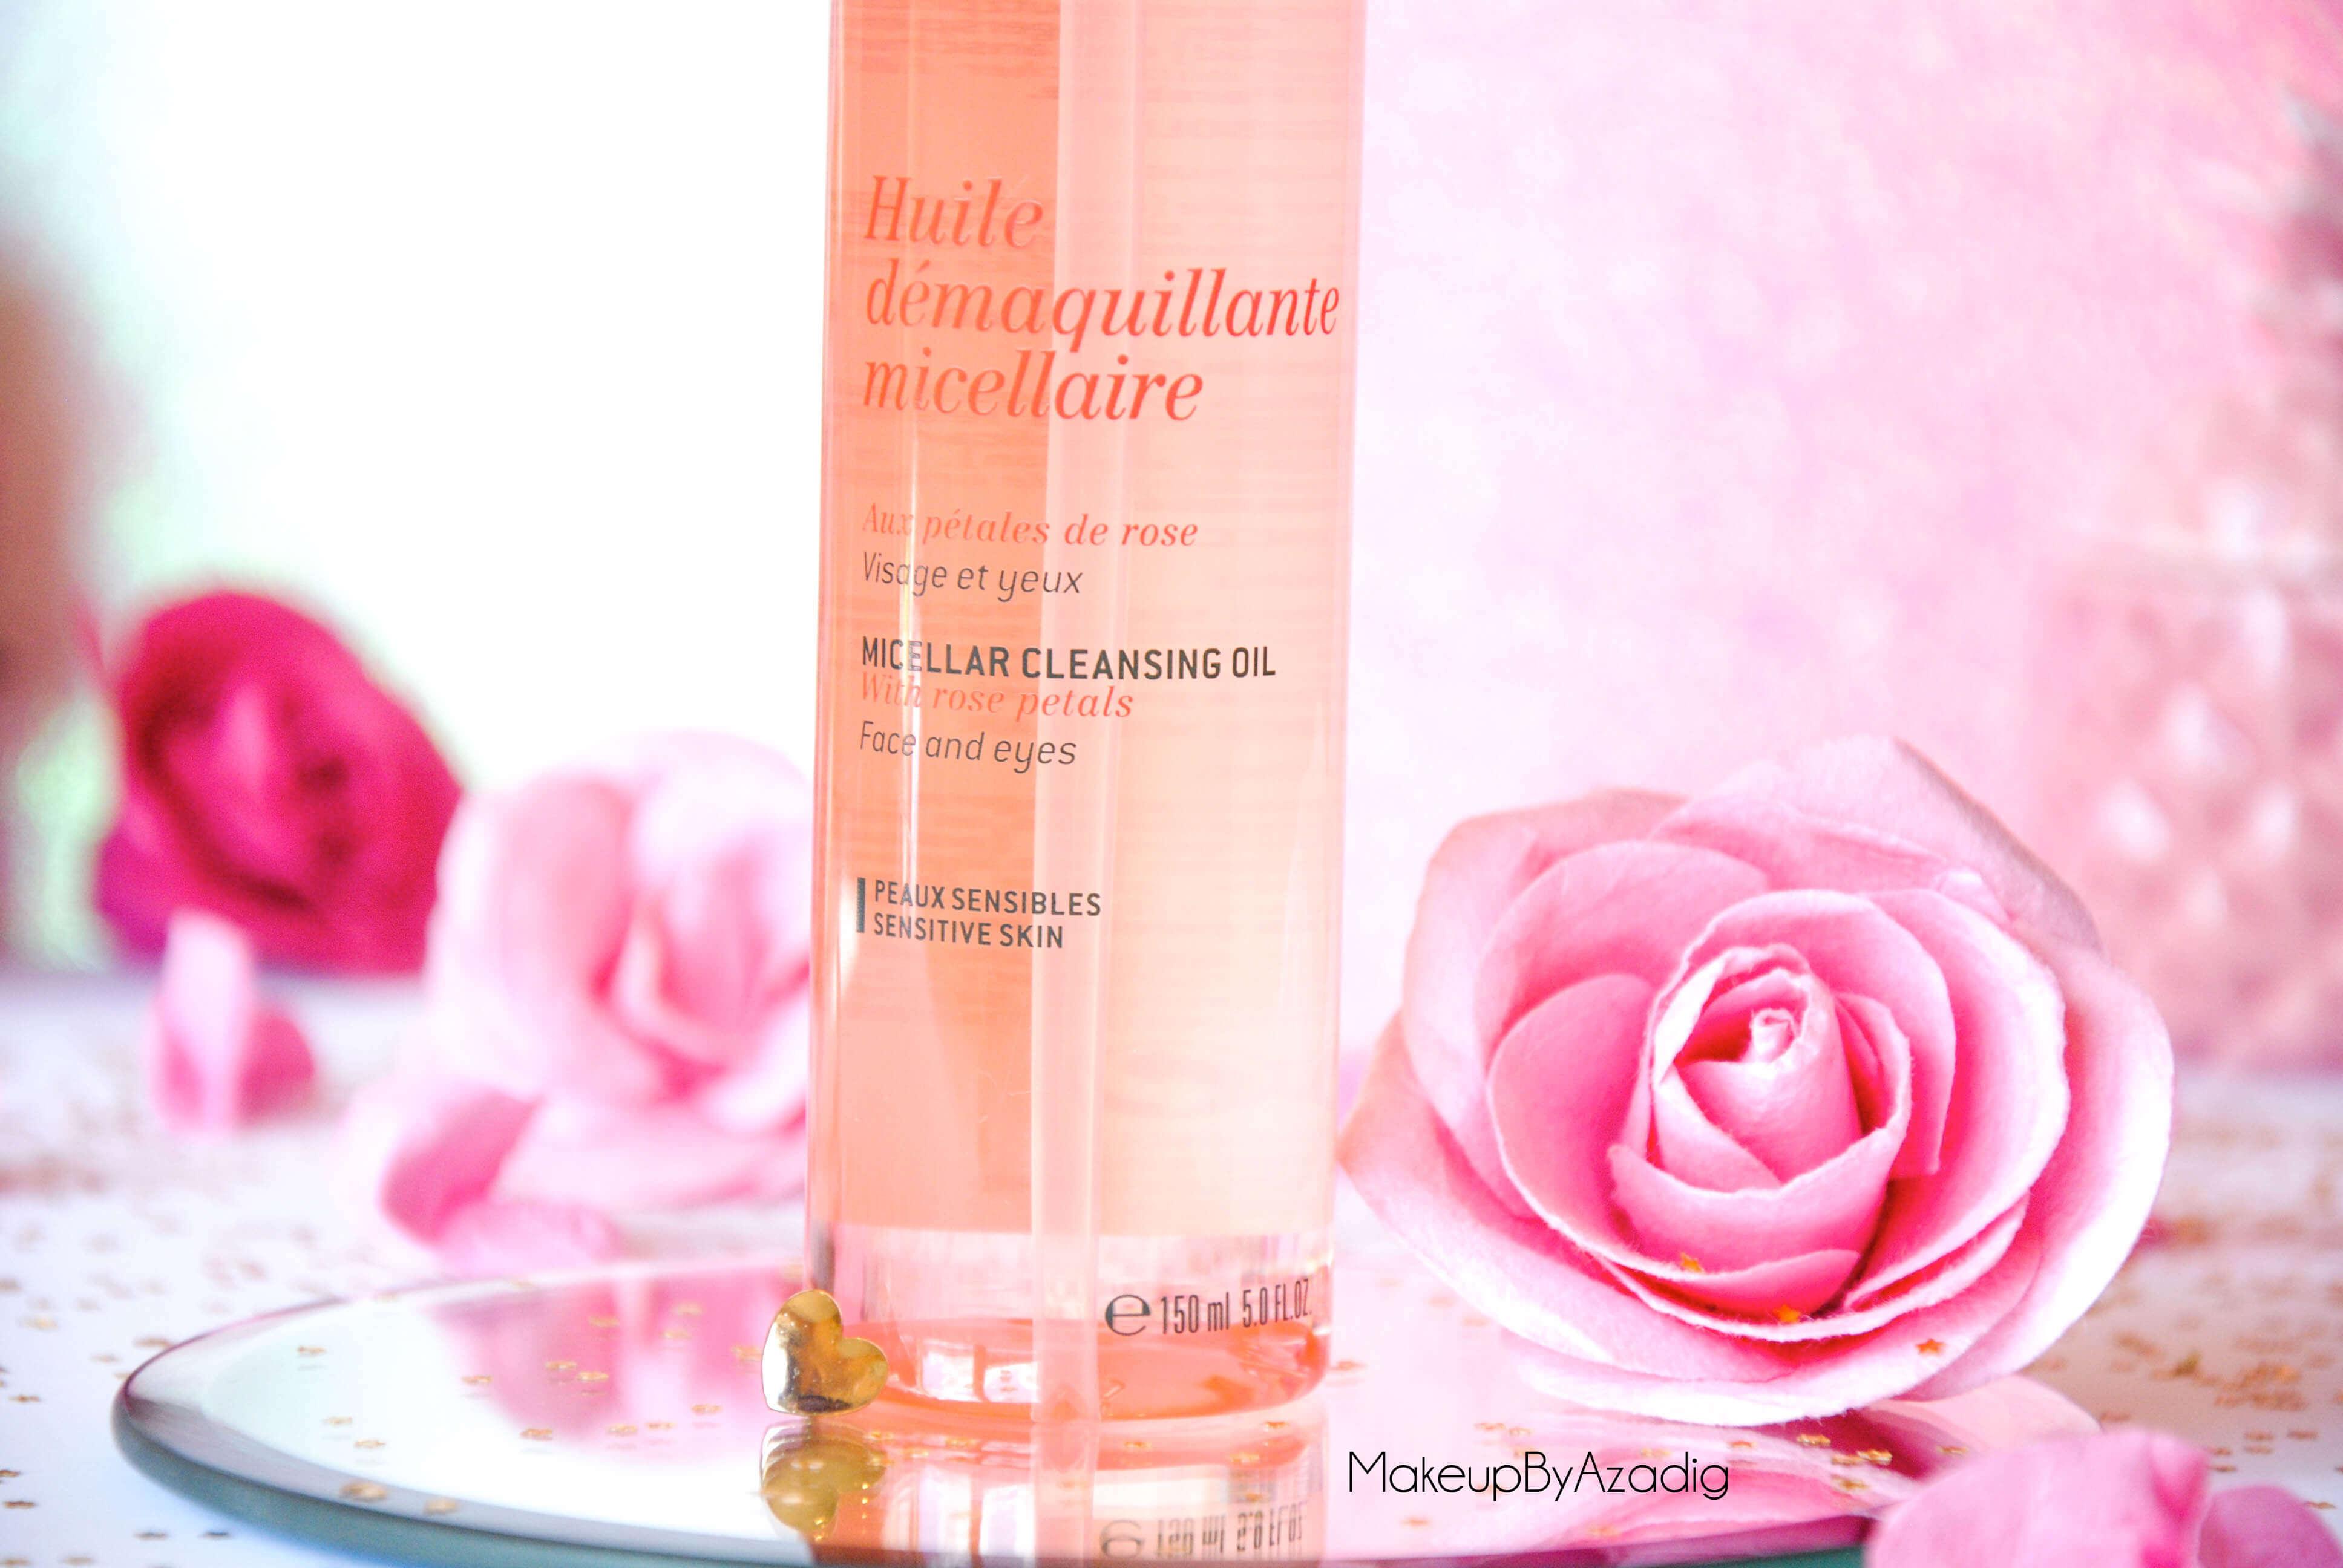 makeupbyazadig-huile-demaquillante-micellaire-nuxe-petales-de-rose-doctipharma-revue-avis-prix-petals